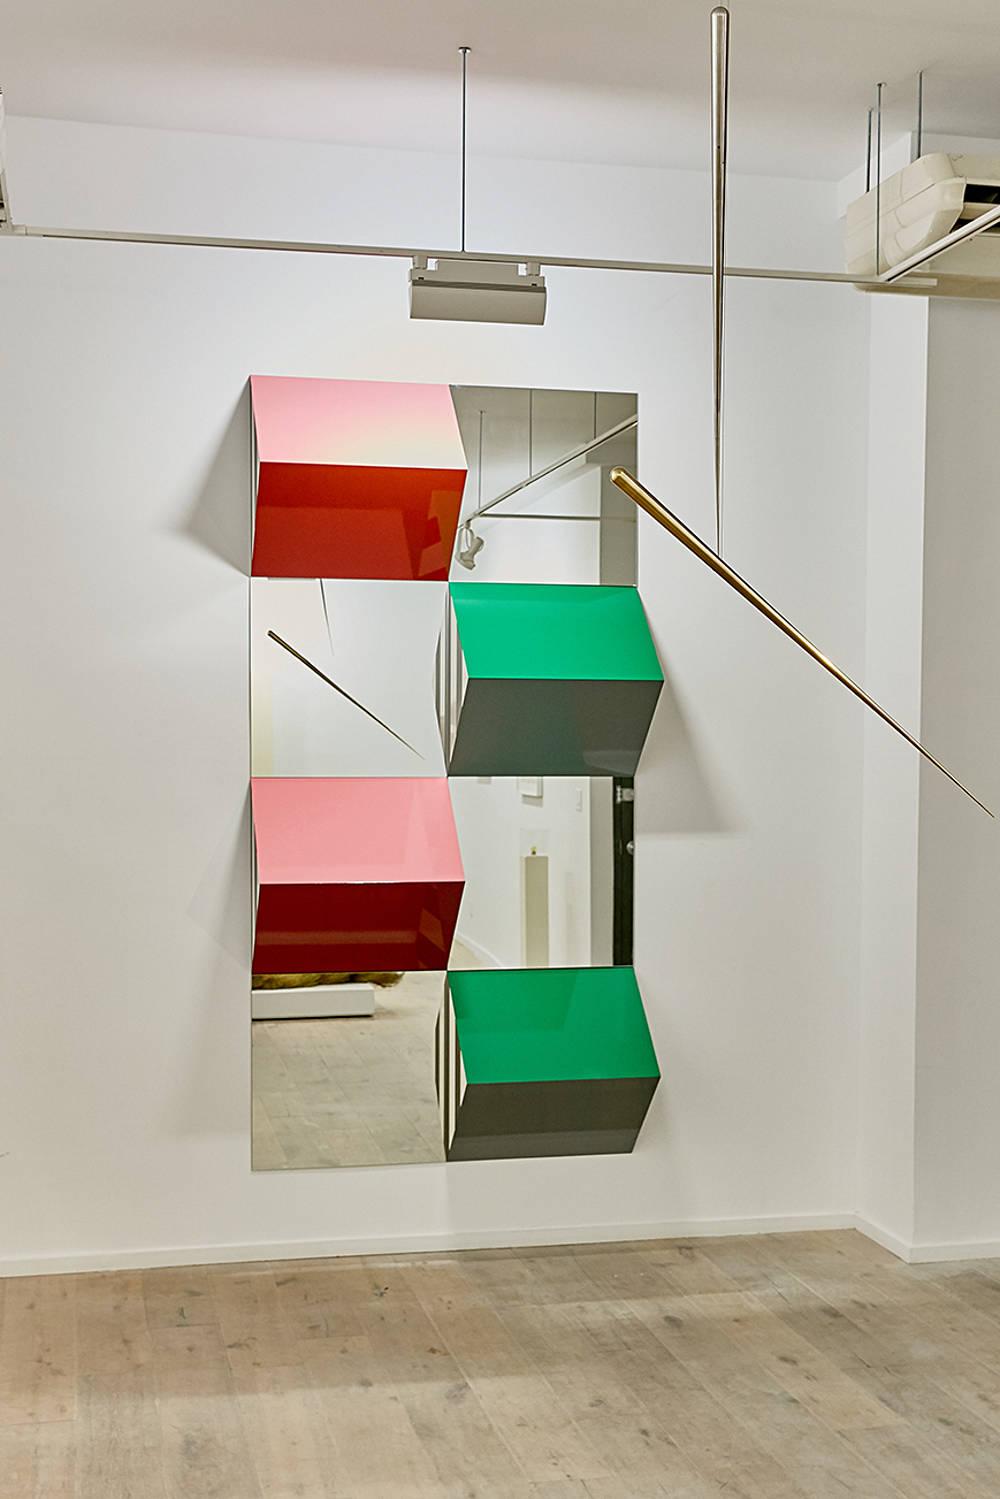 Galeria Nara Roesler New York GNR Presents 4